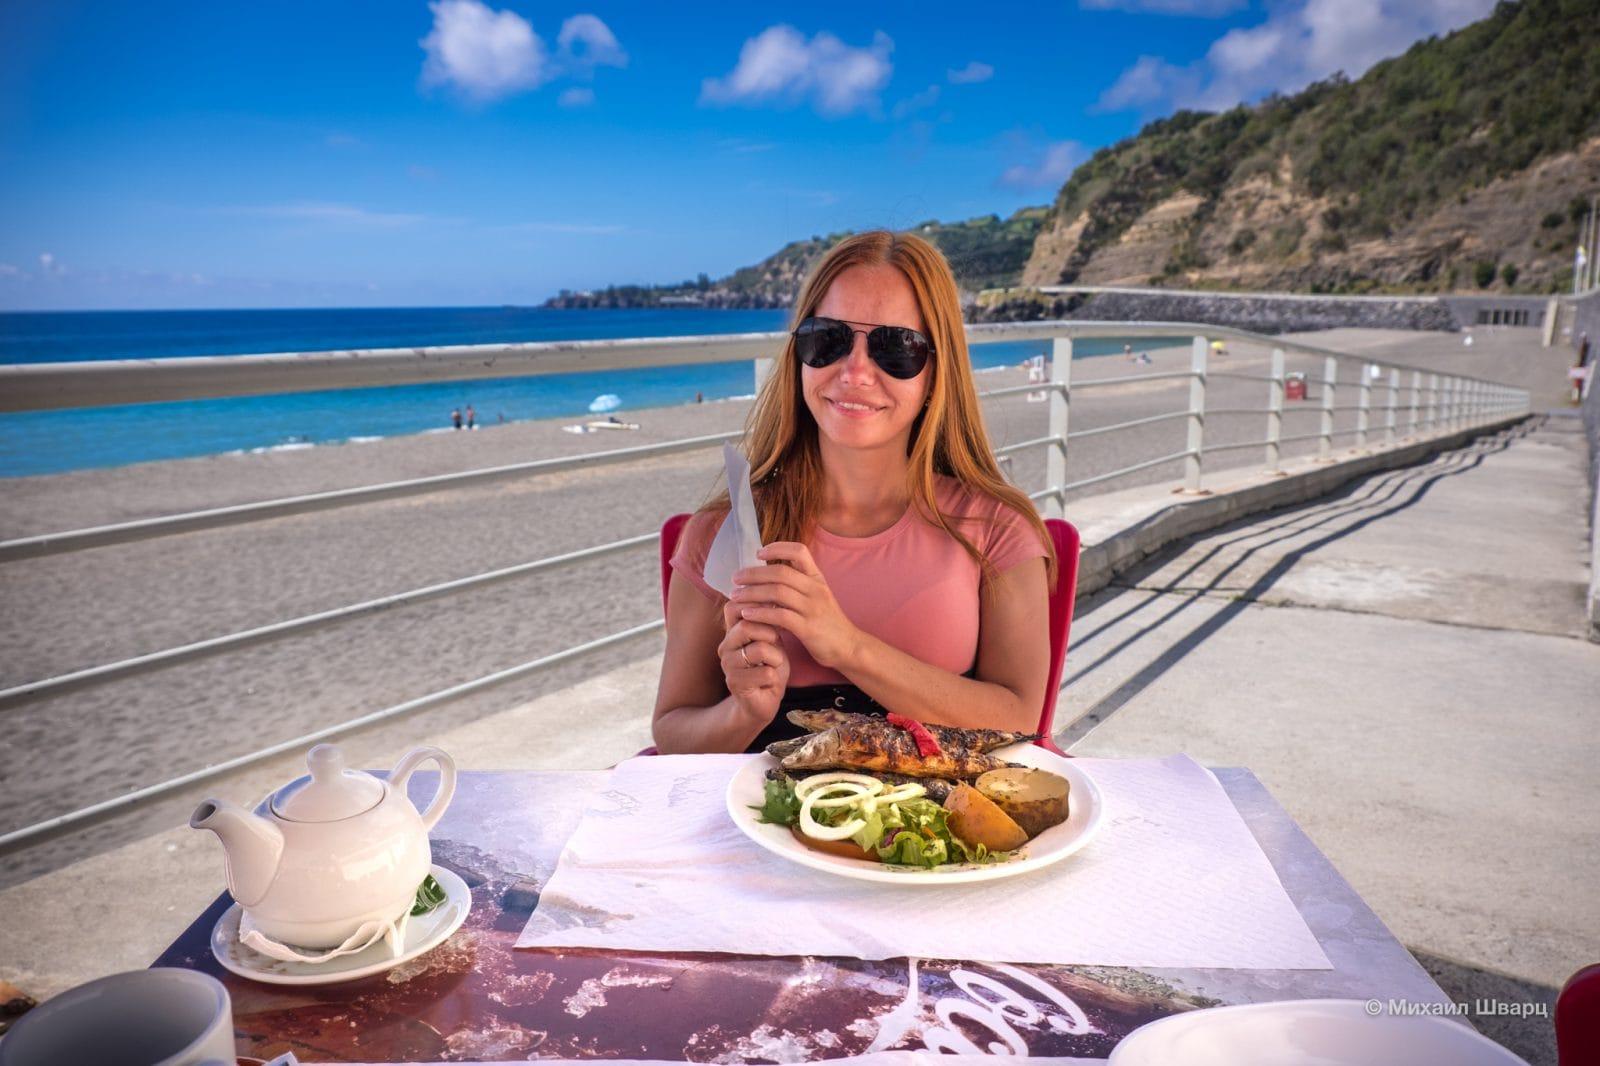 Приятно пообедать на берегу океана